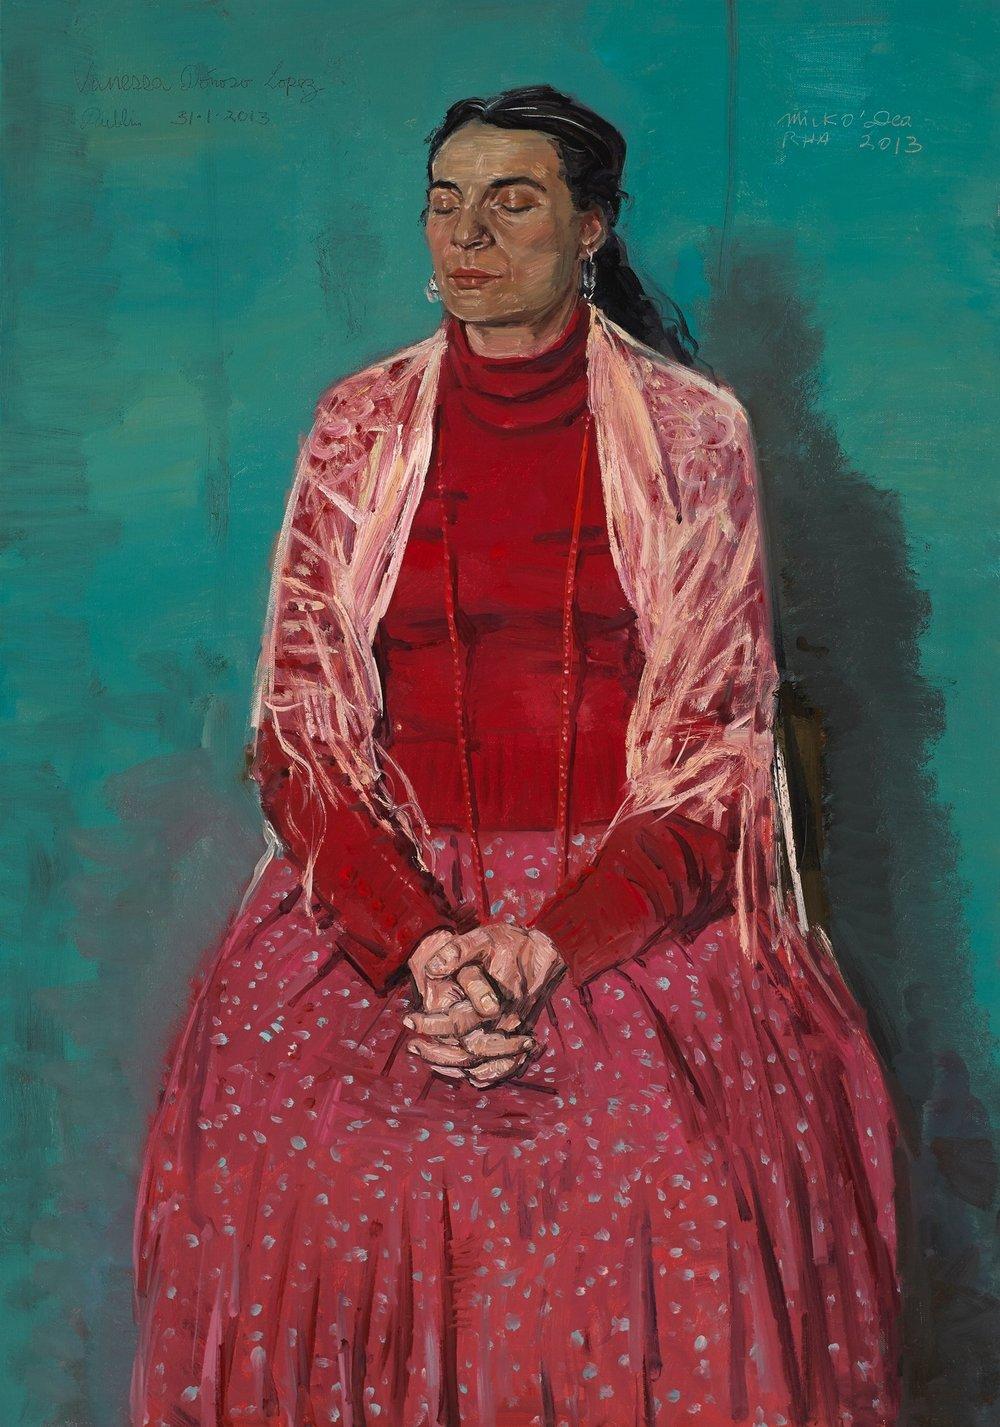 Vanessa Donoso Lopez, Oil on Canvas